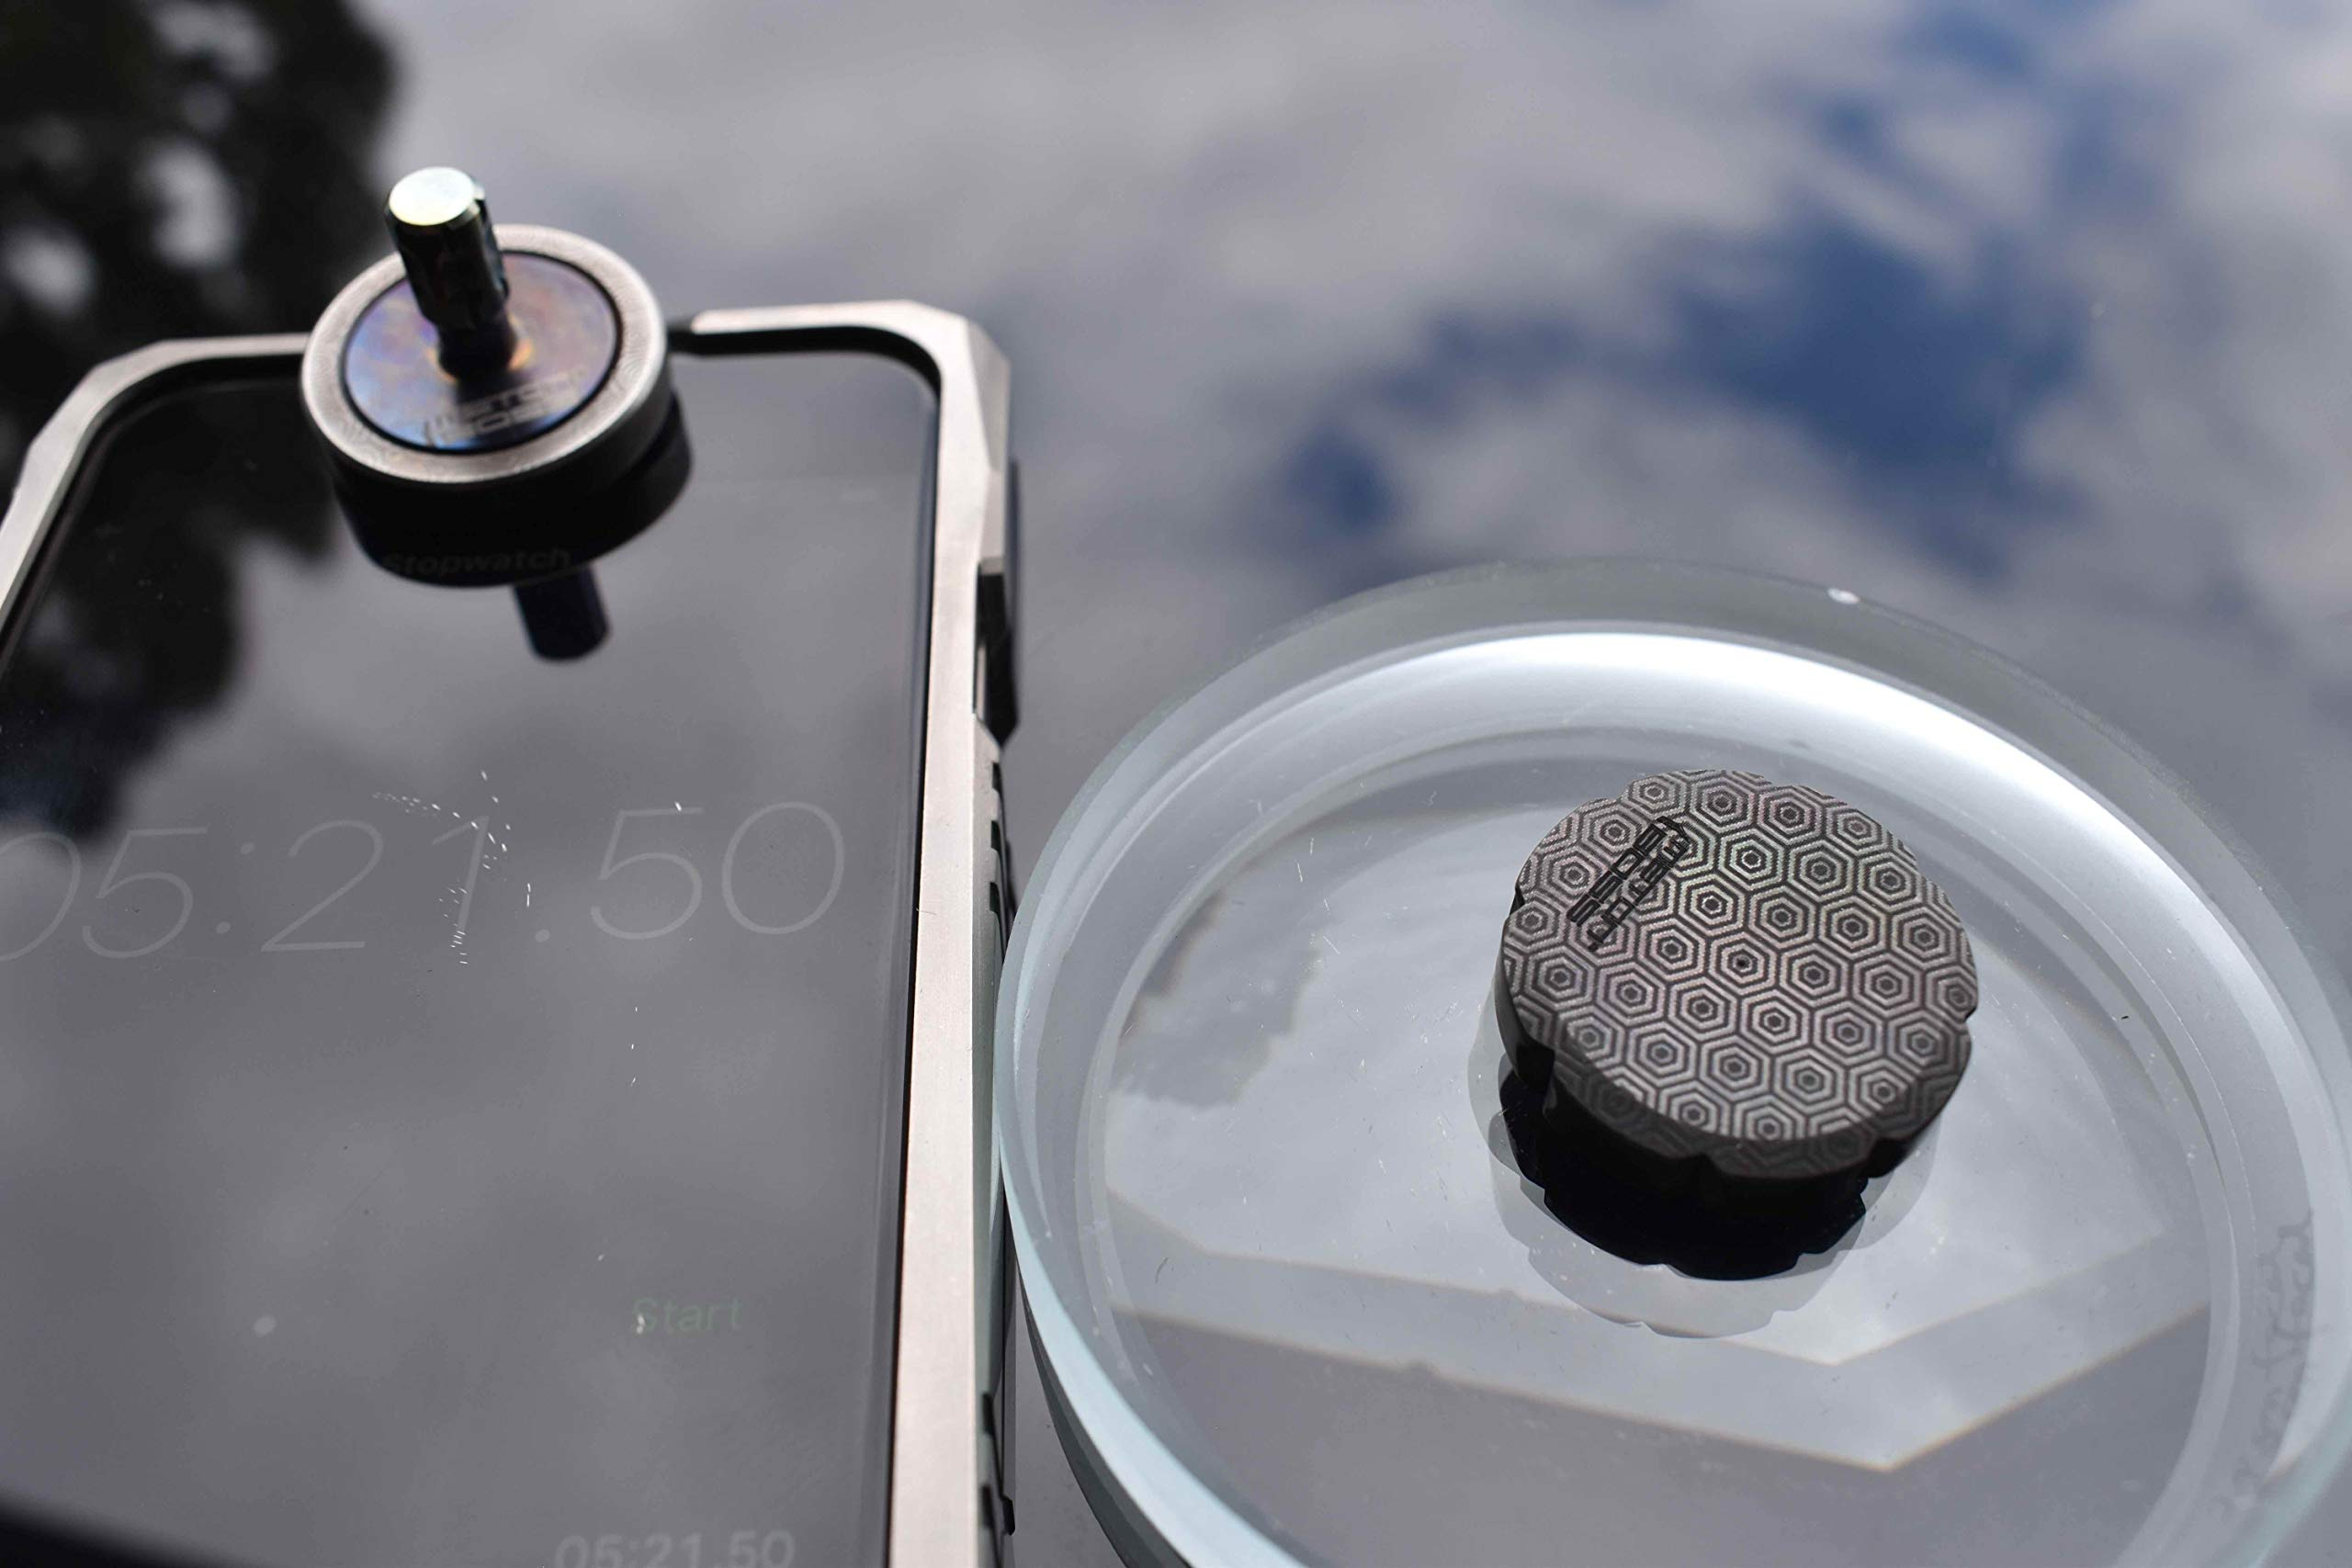 MetonBoss Worry Coin Black Zirconium & Ruby Bearing   Everyday Carry Gear   Precision-Made and Desktop Display by MetonBoss (Image #9)